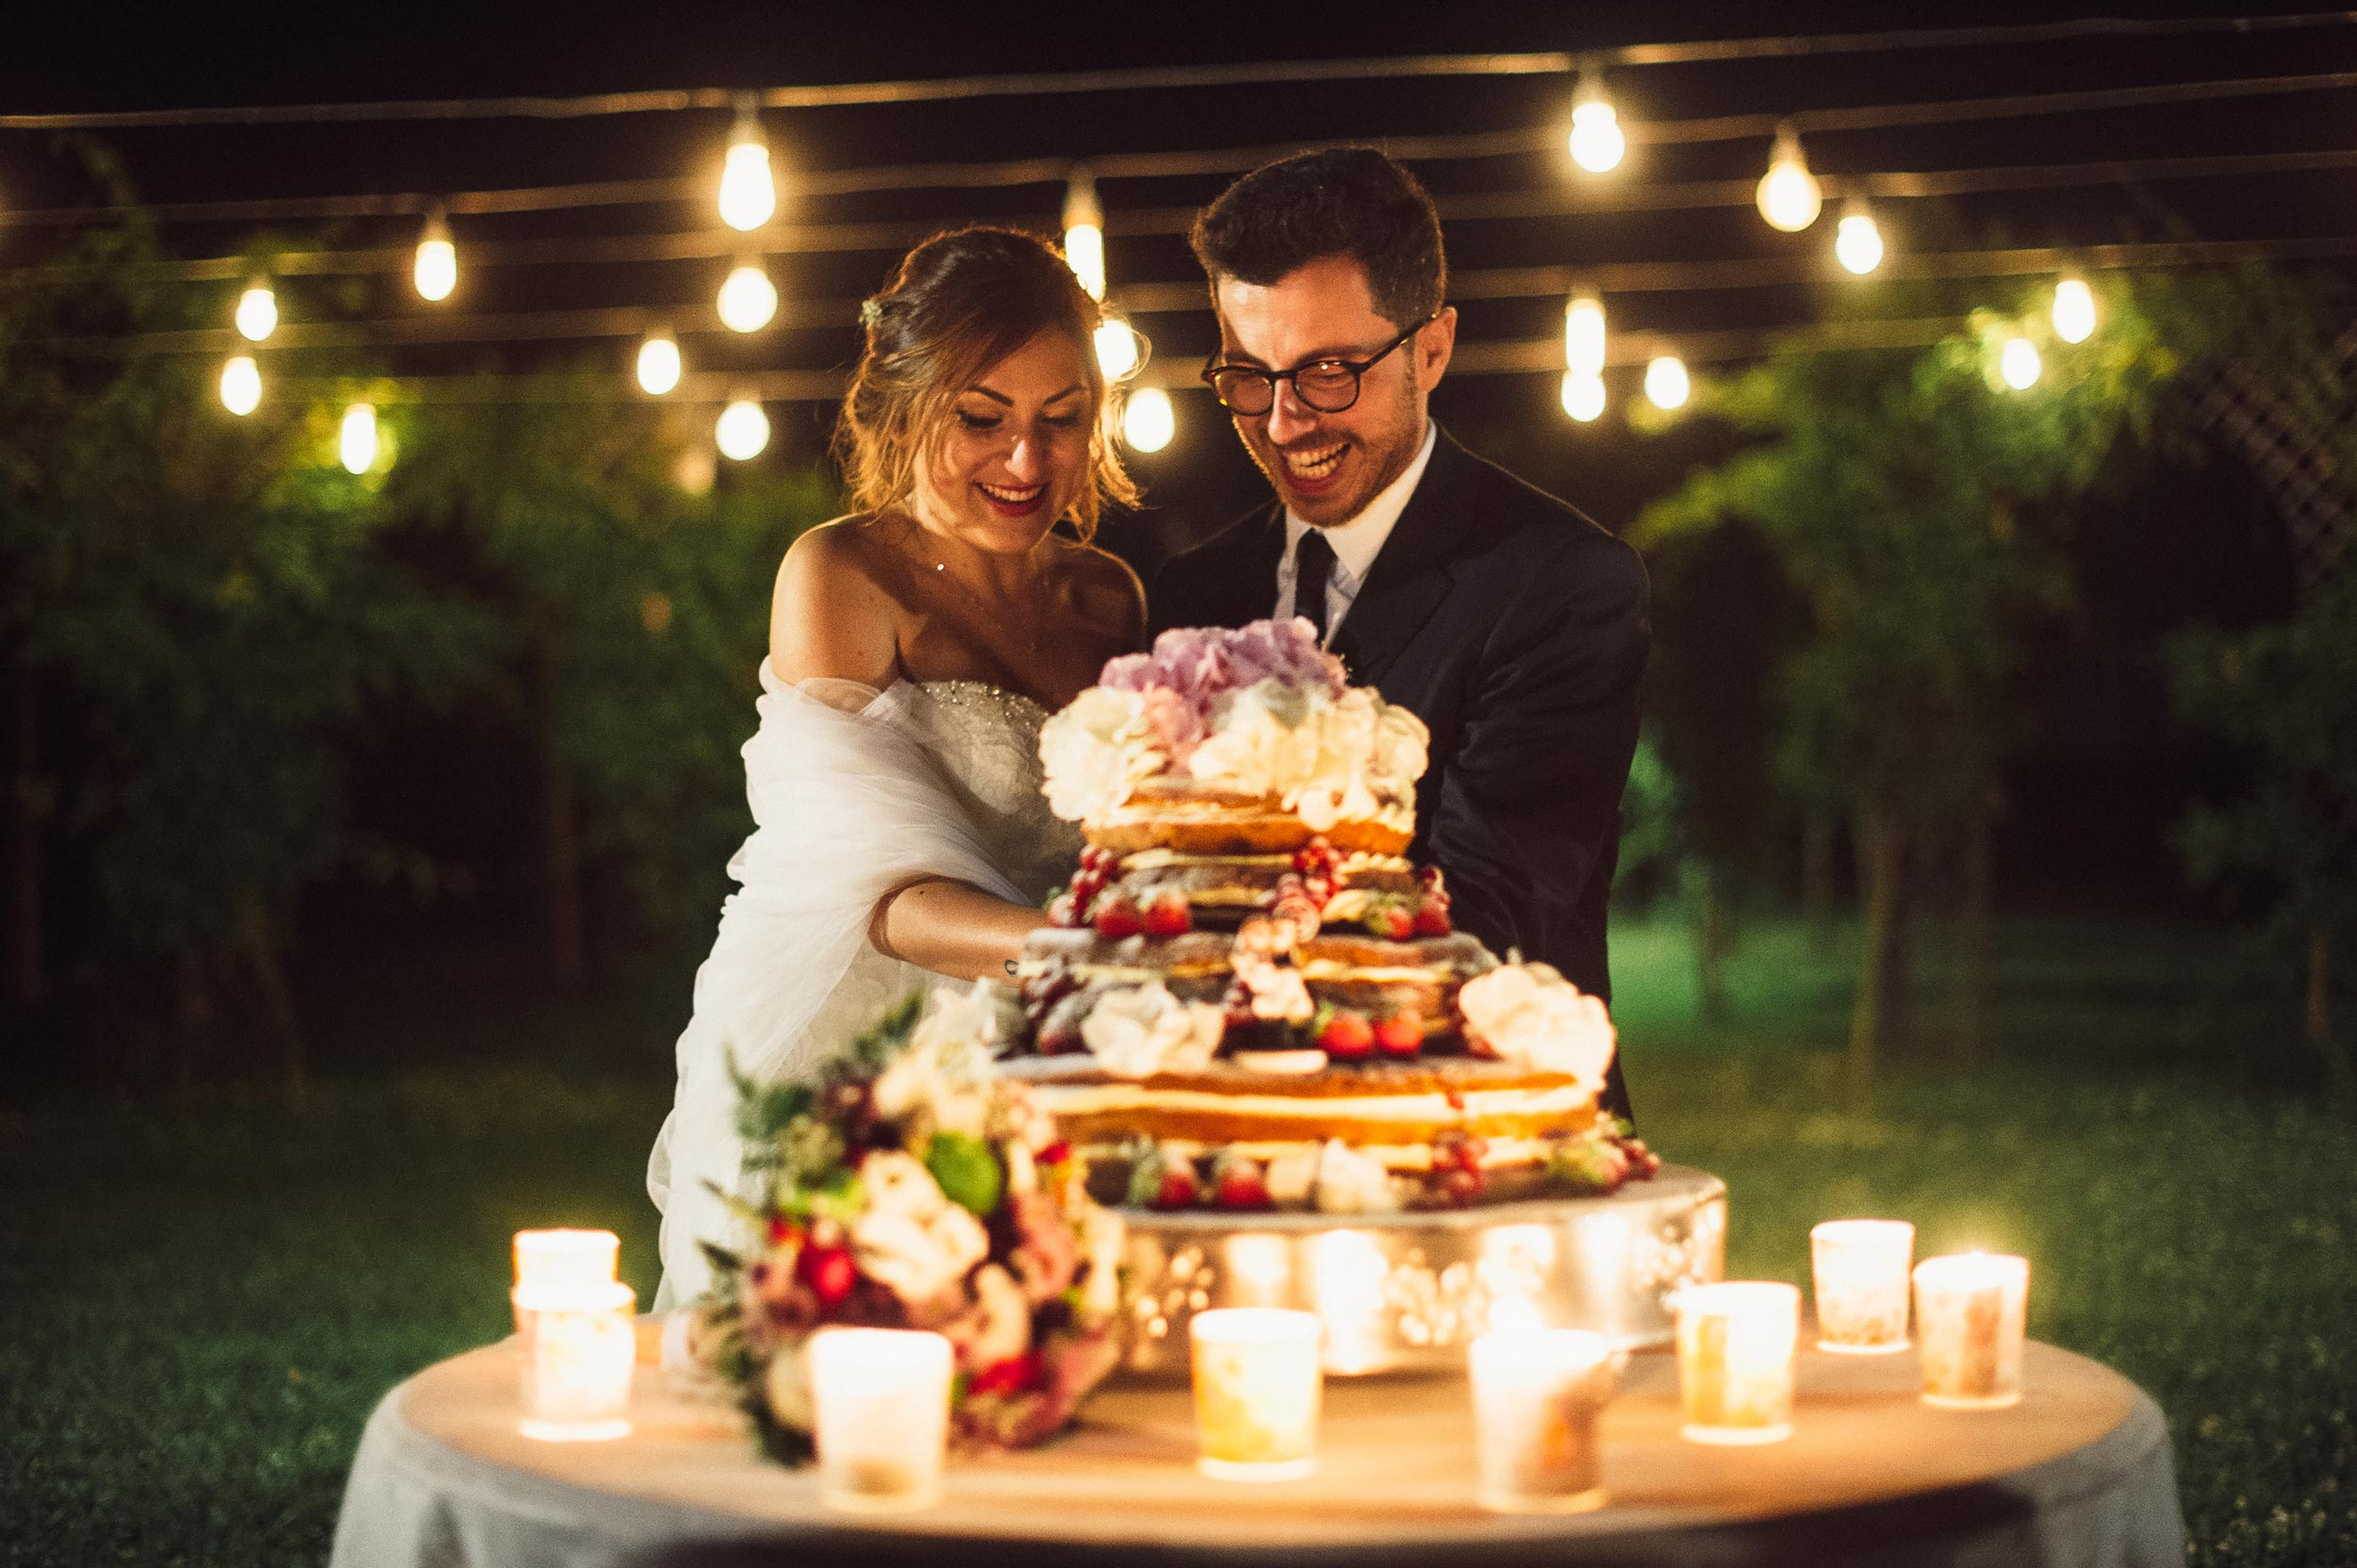 2016-Claudio-Teresa-Naples-Wedding-Photographer-Italy-Alessandro-Avenali-125.jpg